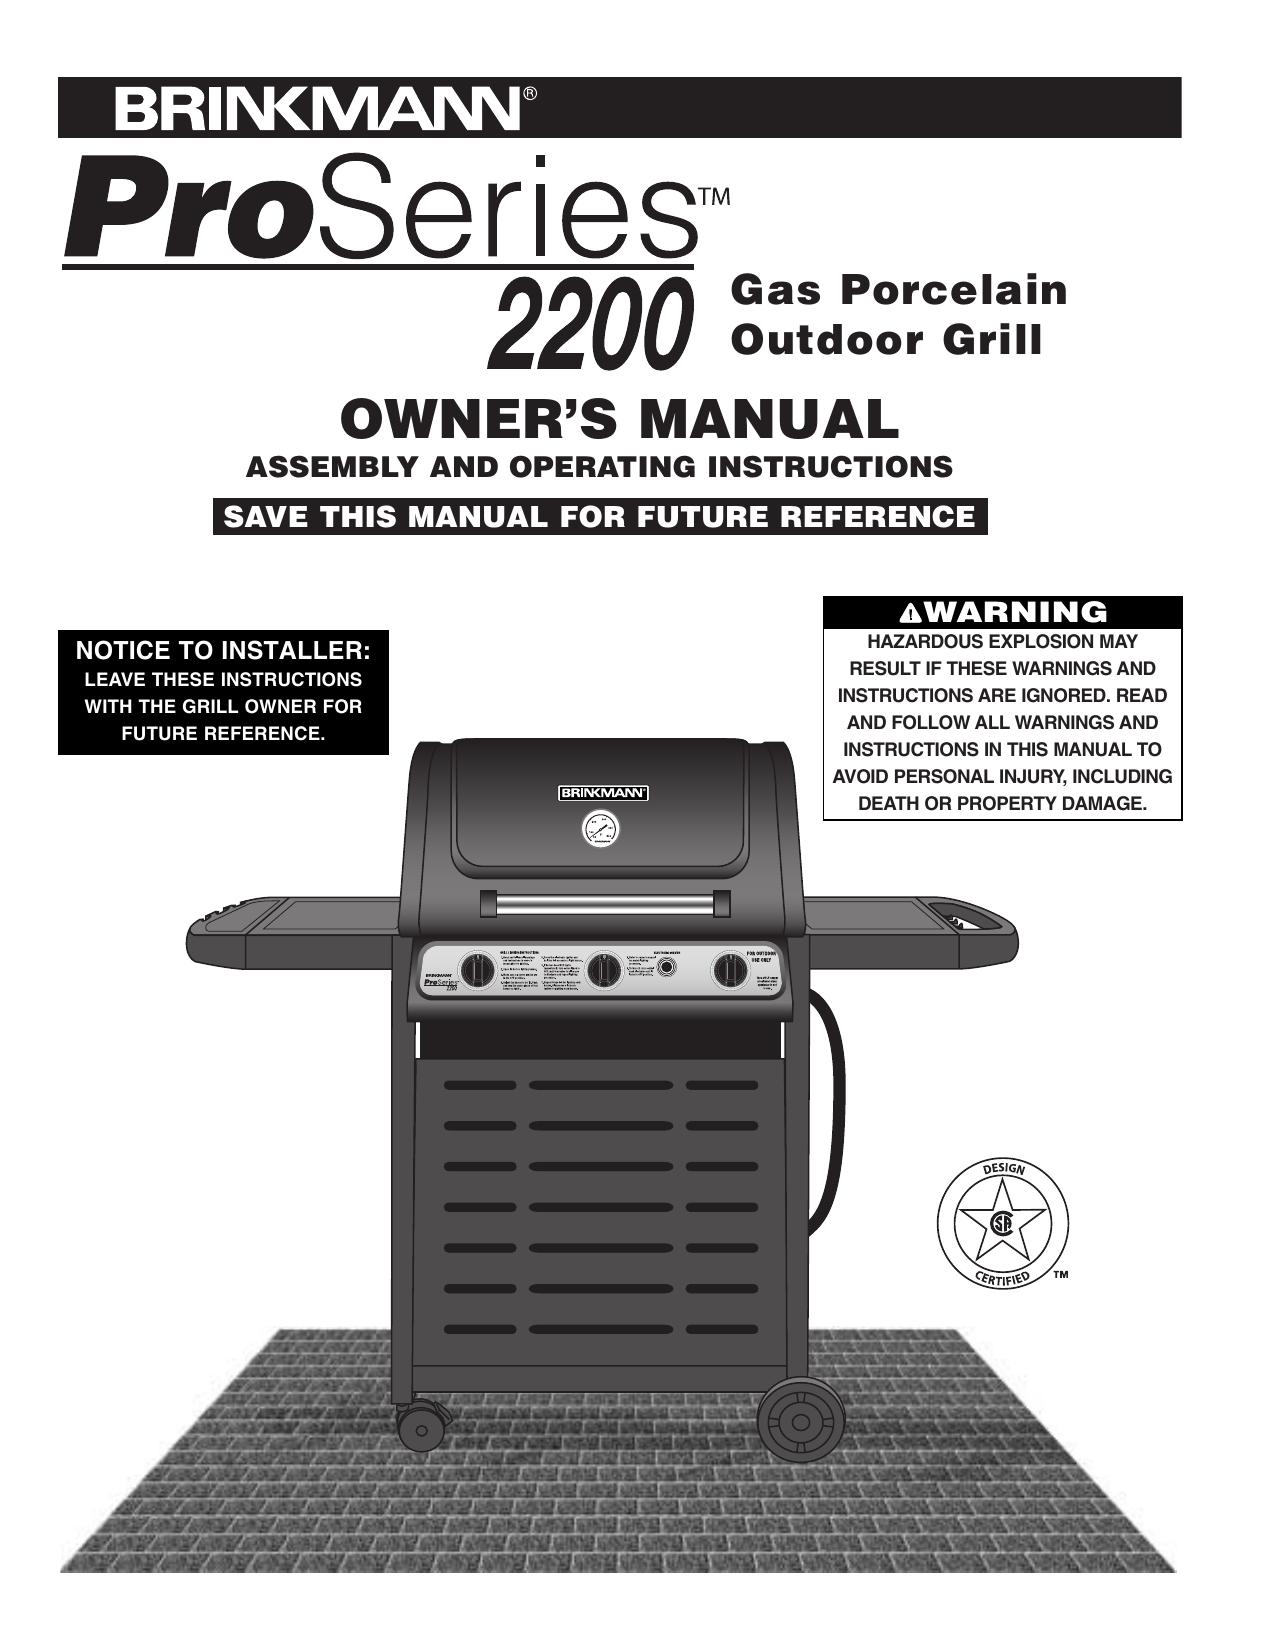 Brinkmann Electric Smoker Grill Manual | Bruin Blog